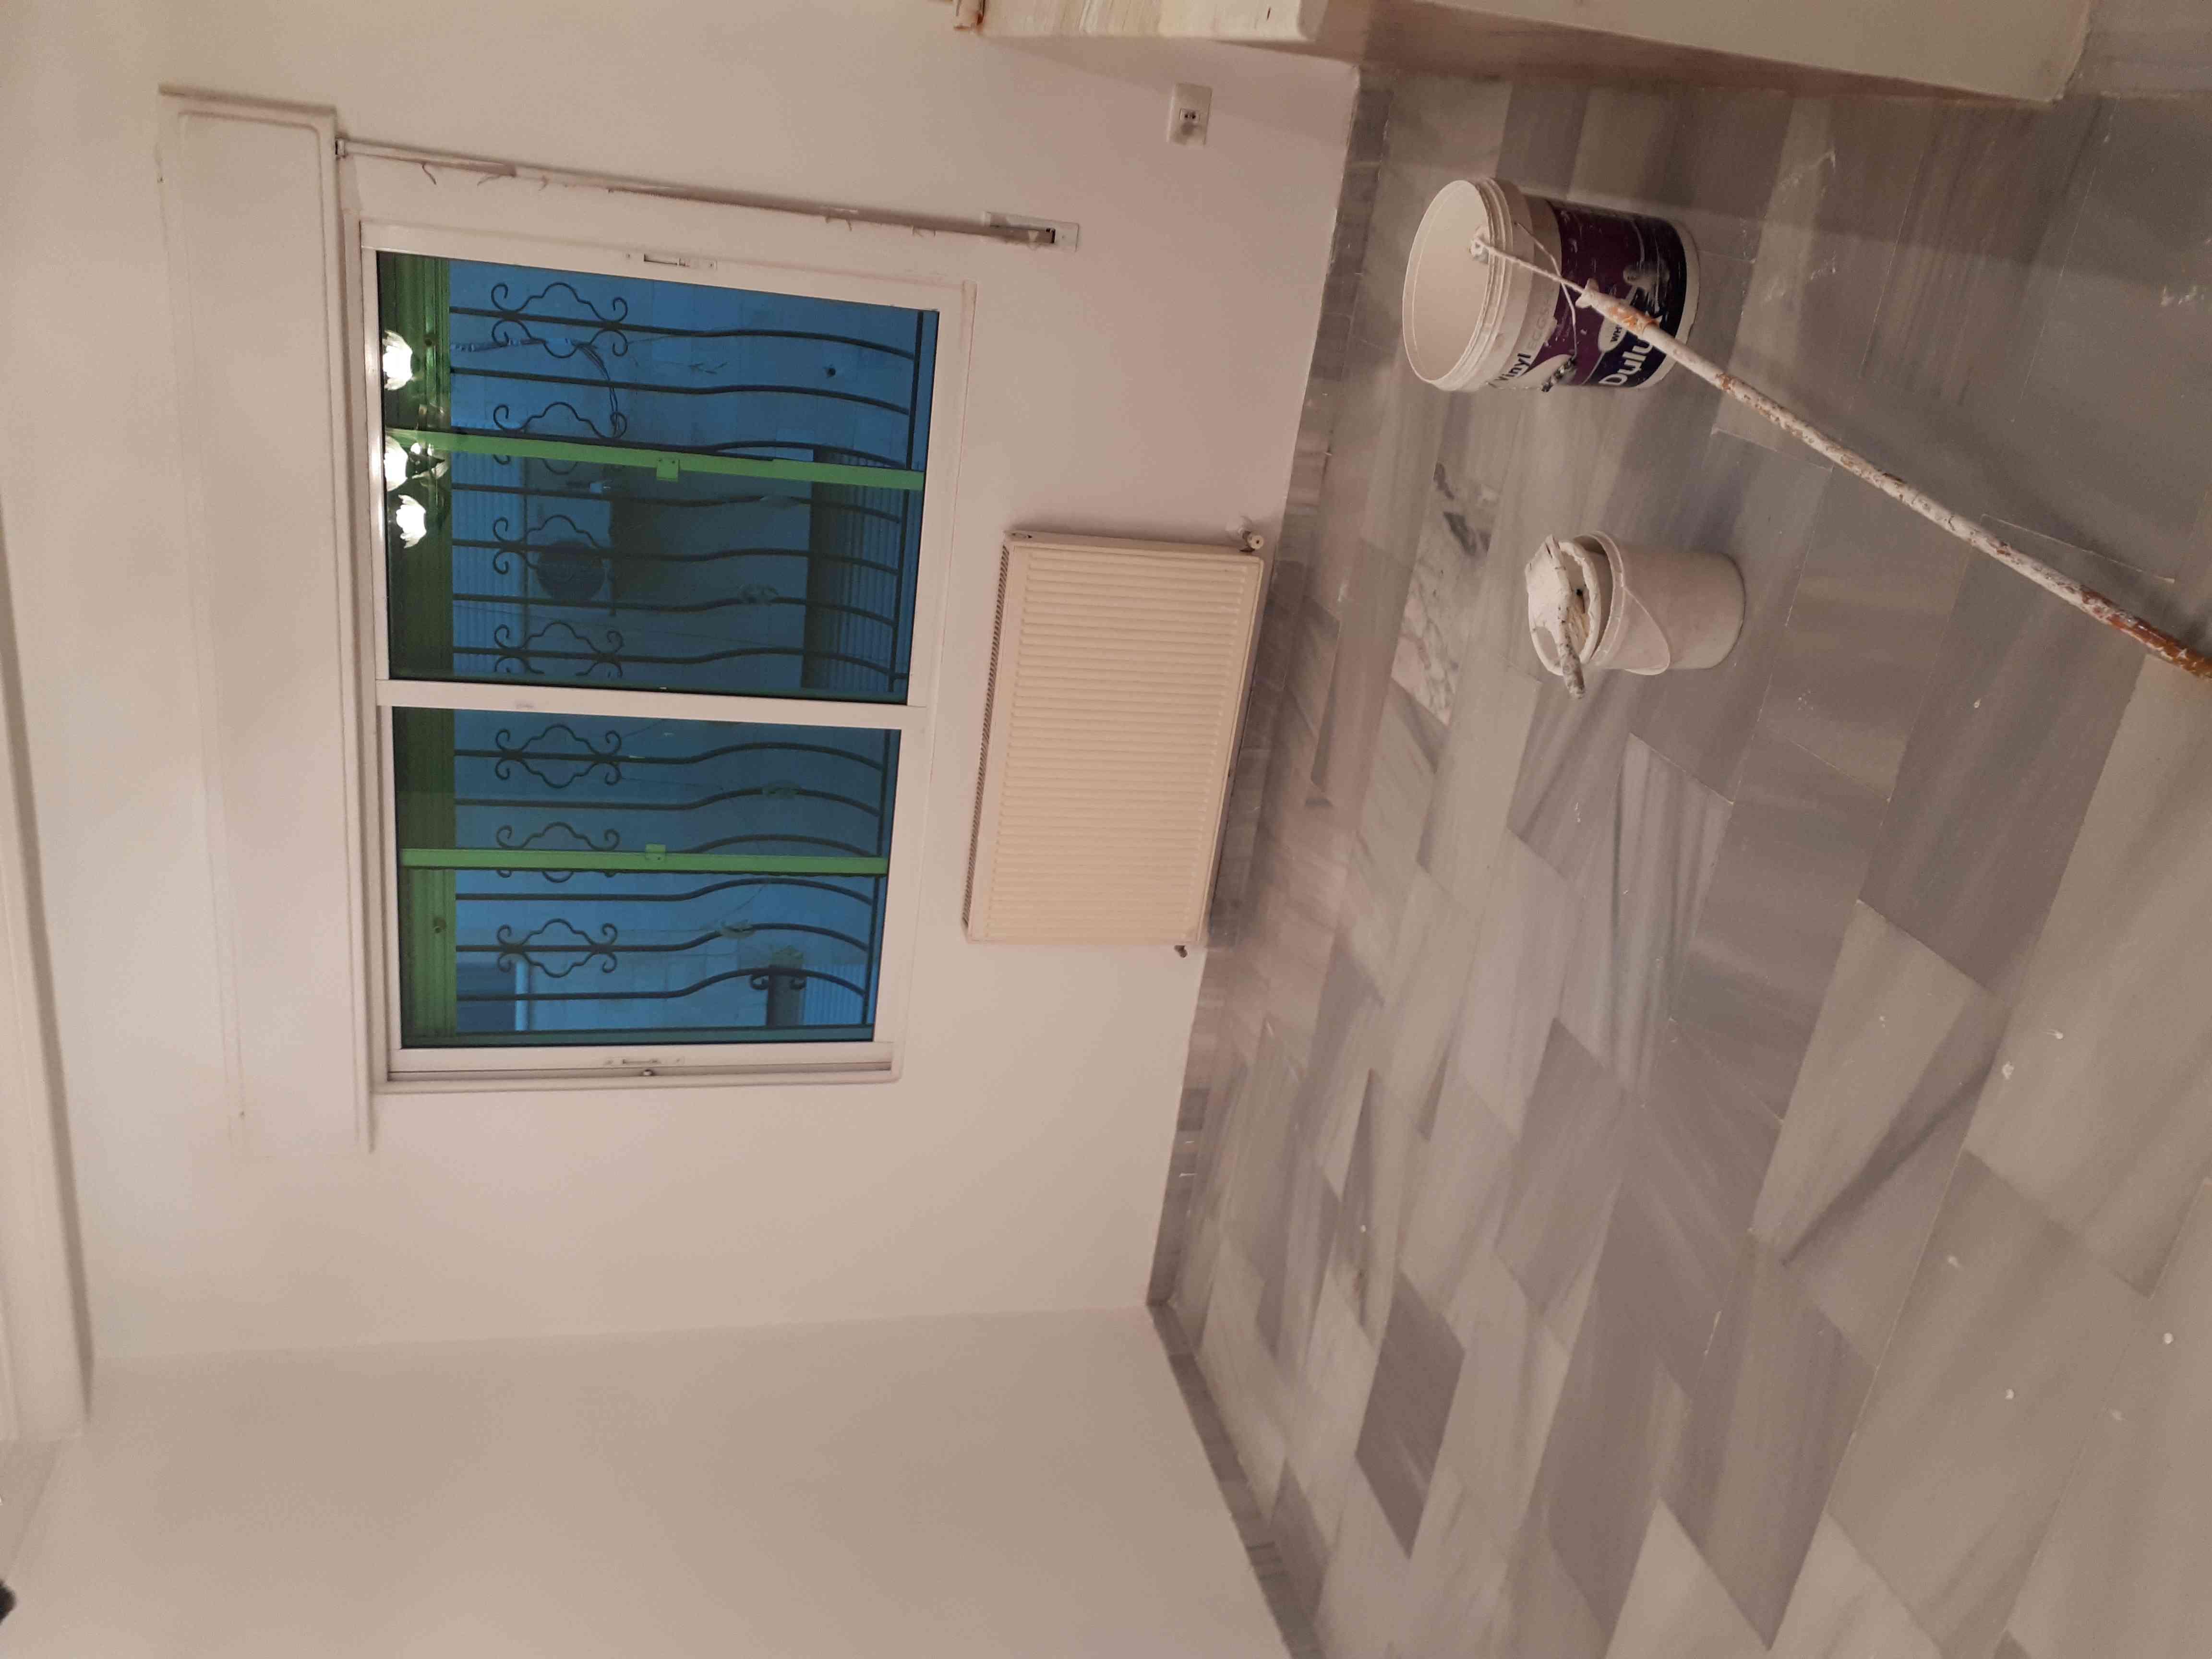 Brand new 1 BHK With 2/bathroom in bain aljesraen (Rabdan area)-  شقه فارغه في الرابيه قرب...